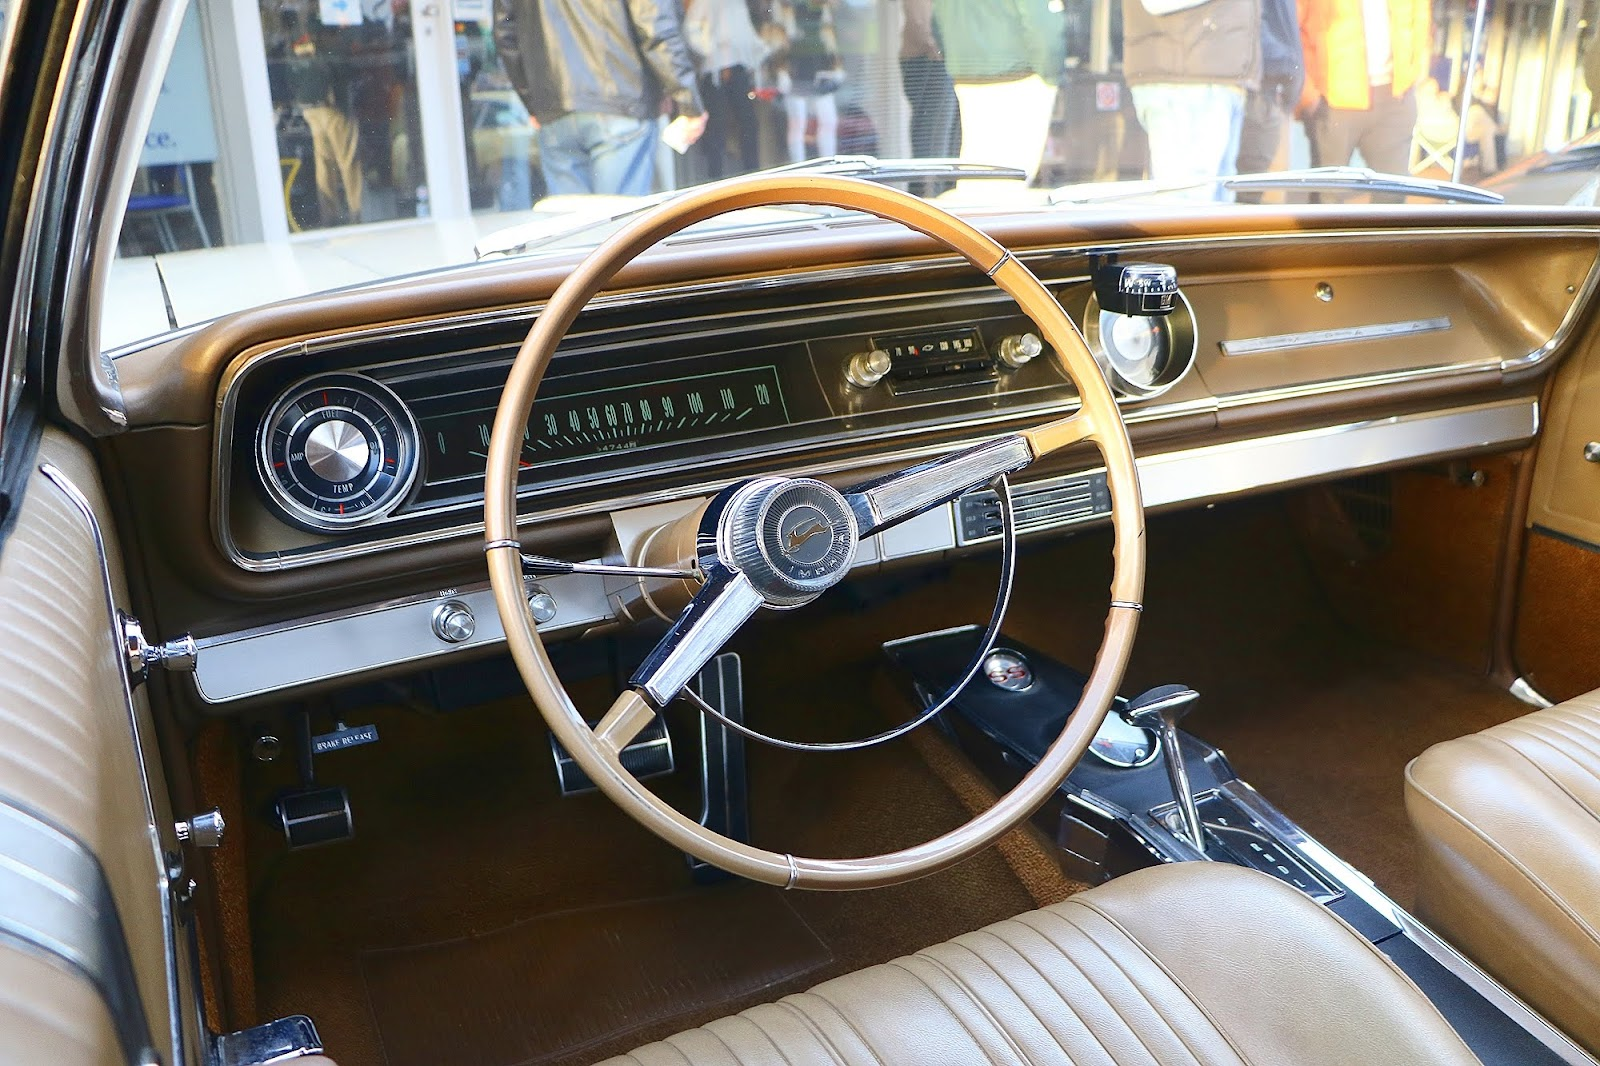 Chevrolet Impala Coupe Dashboard.jpg